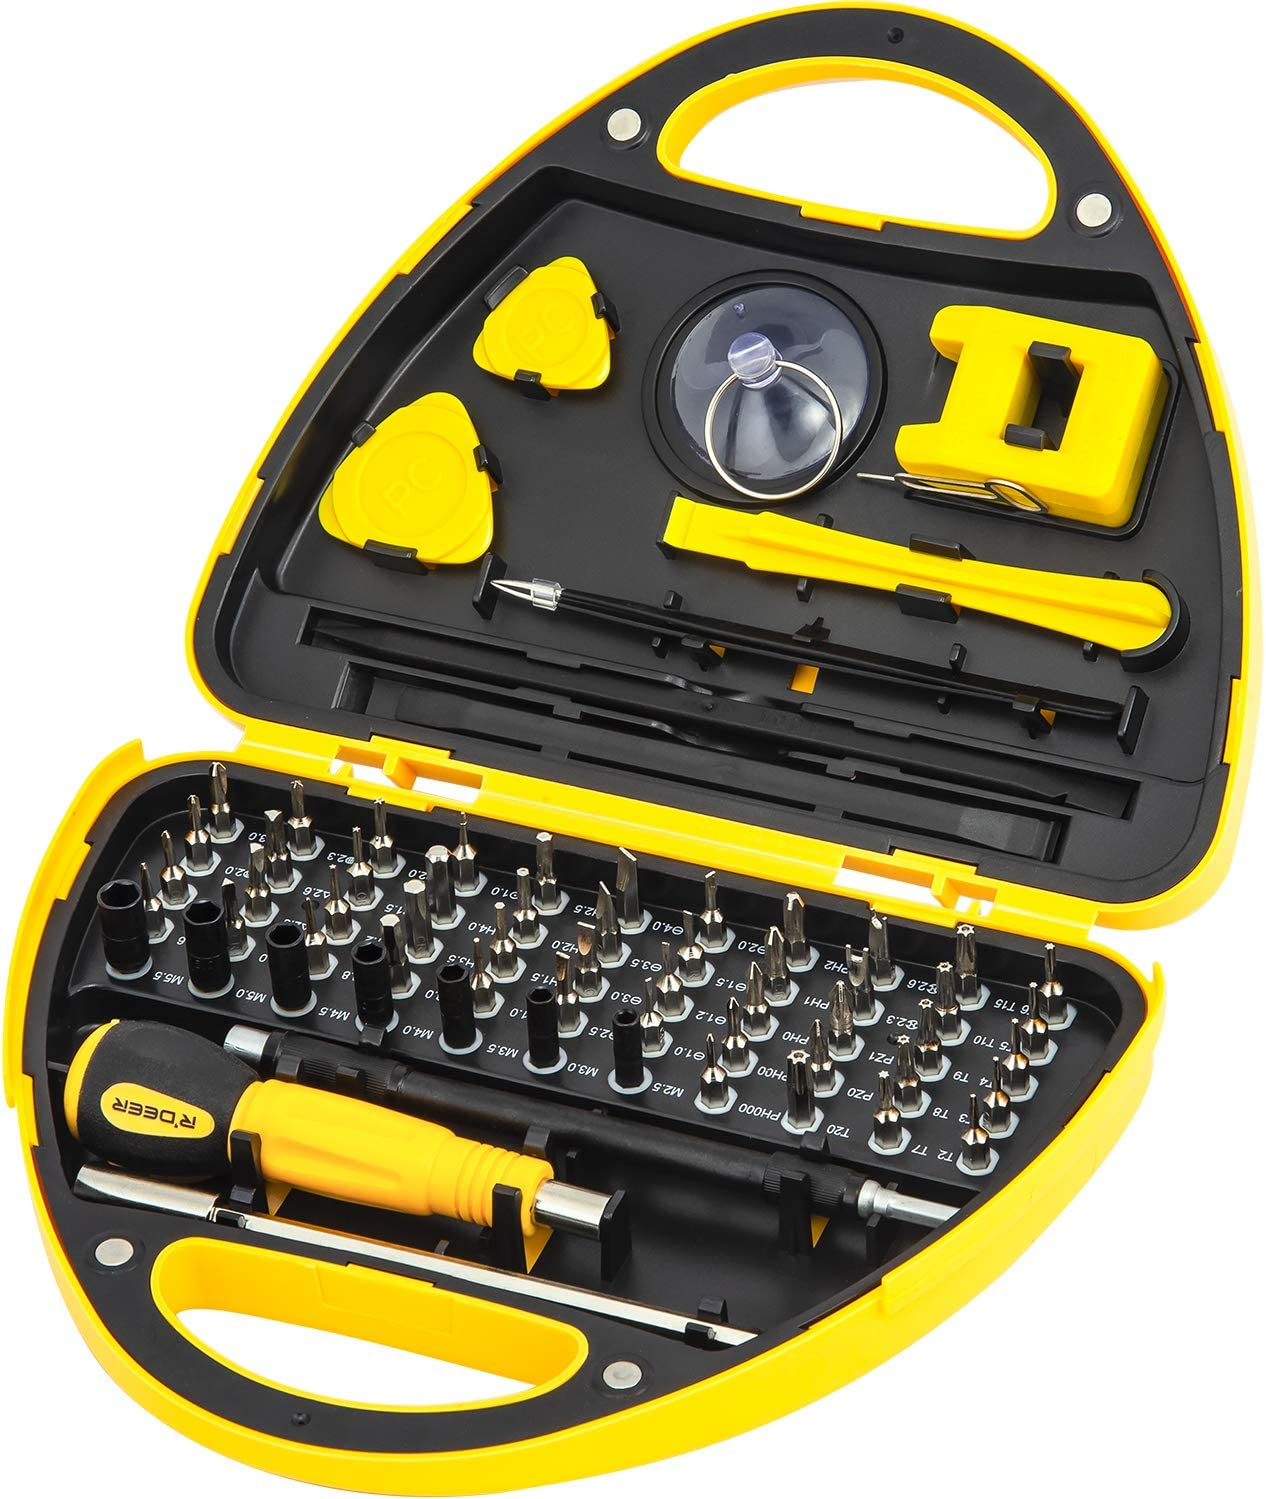 67 in 1 Precision Electronic Screwdriver Set R'deer Magnetic Mul